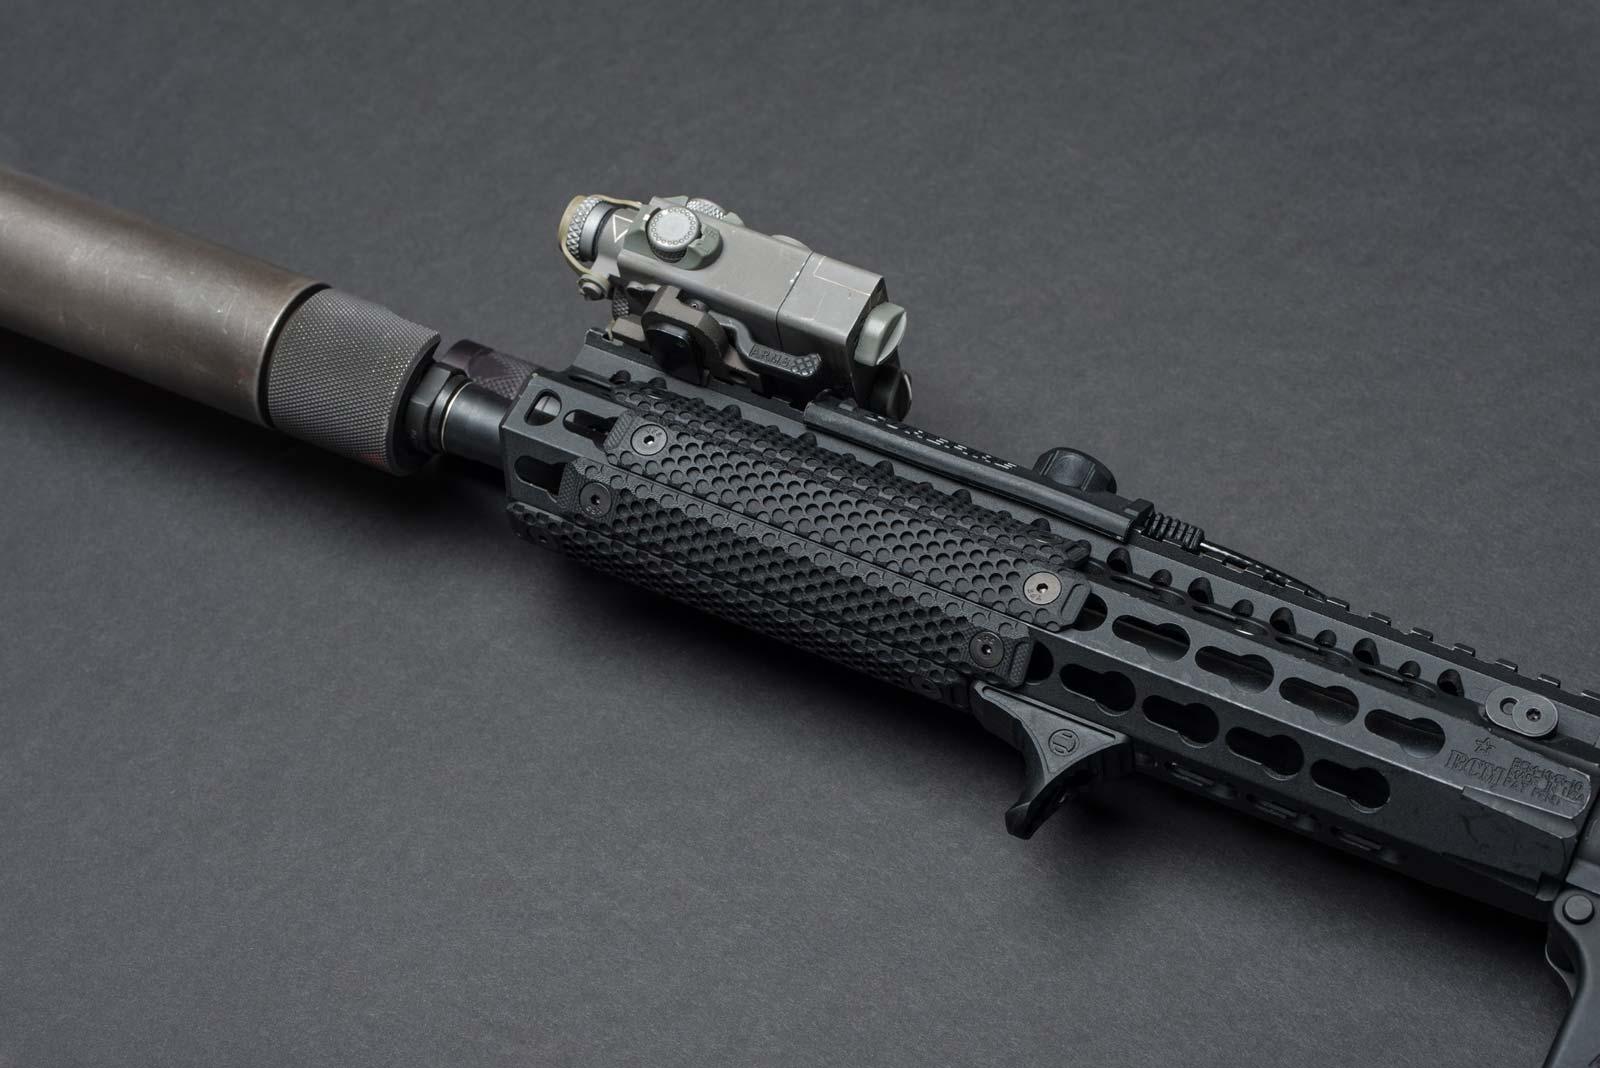 Best AR-15 Handguards